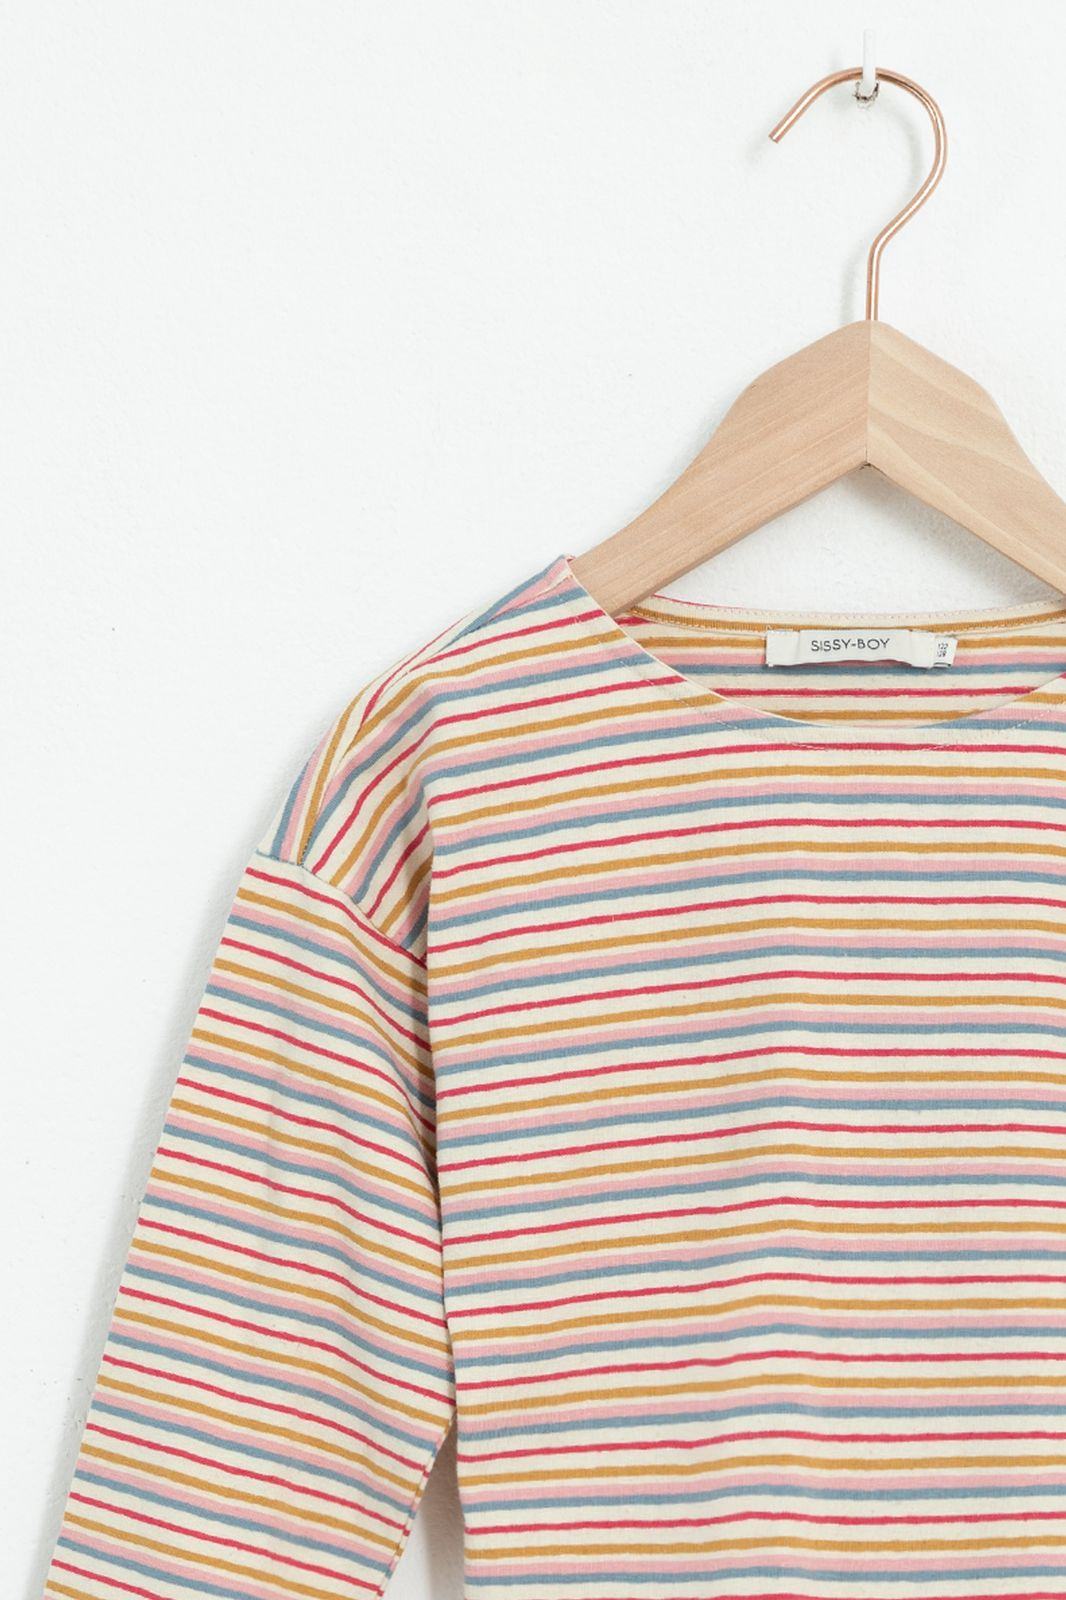 Multicolor gestreept T-shirt met lange mouwen - Kids | Sissy-Boy